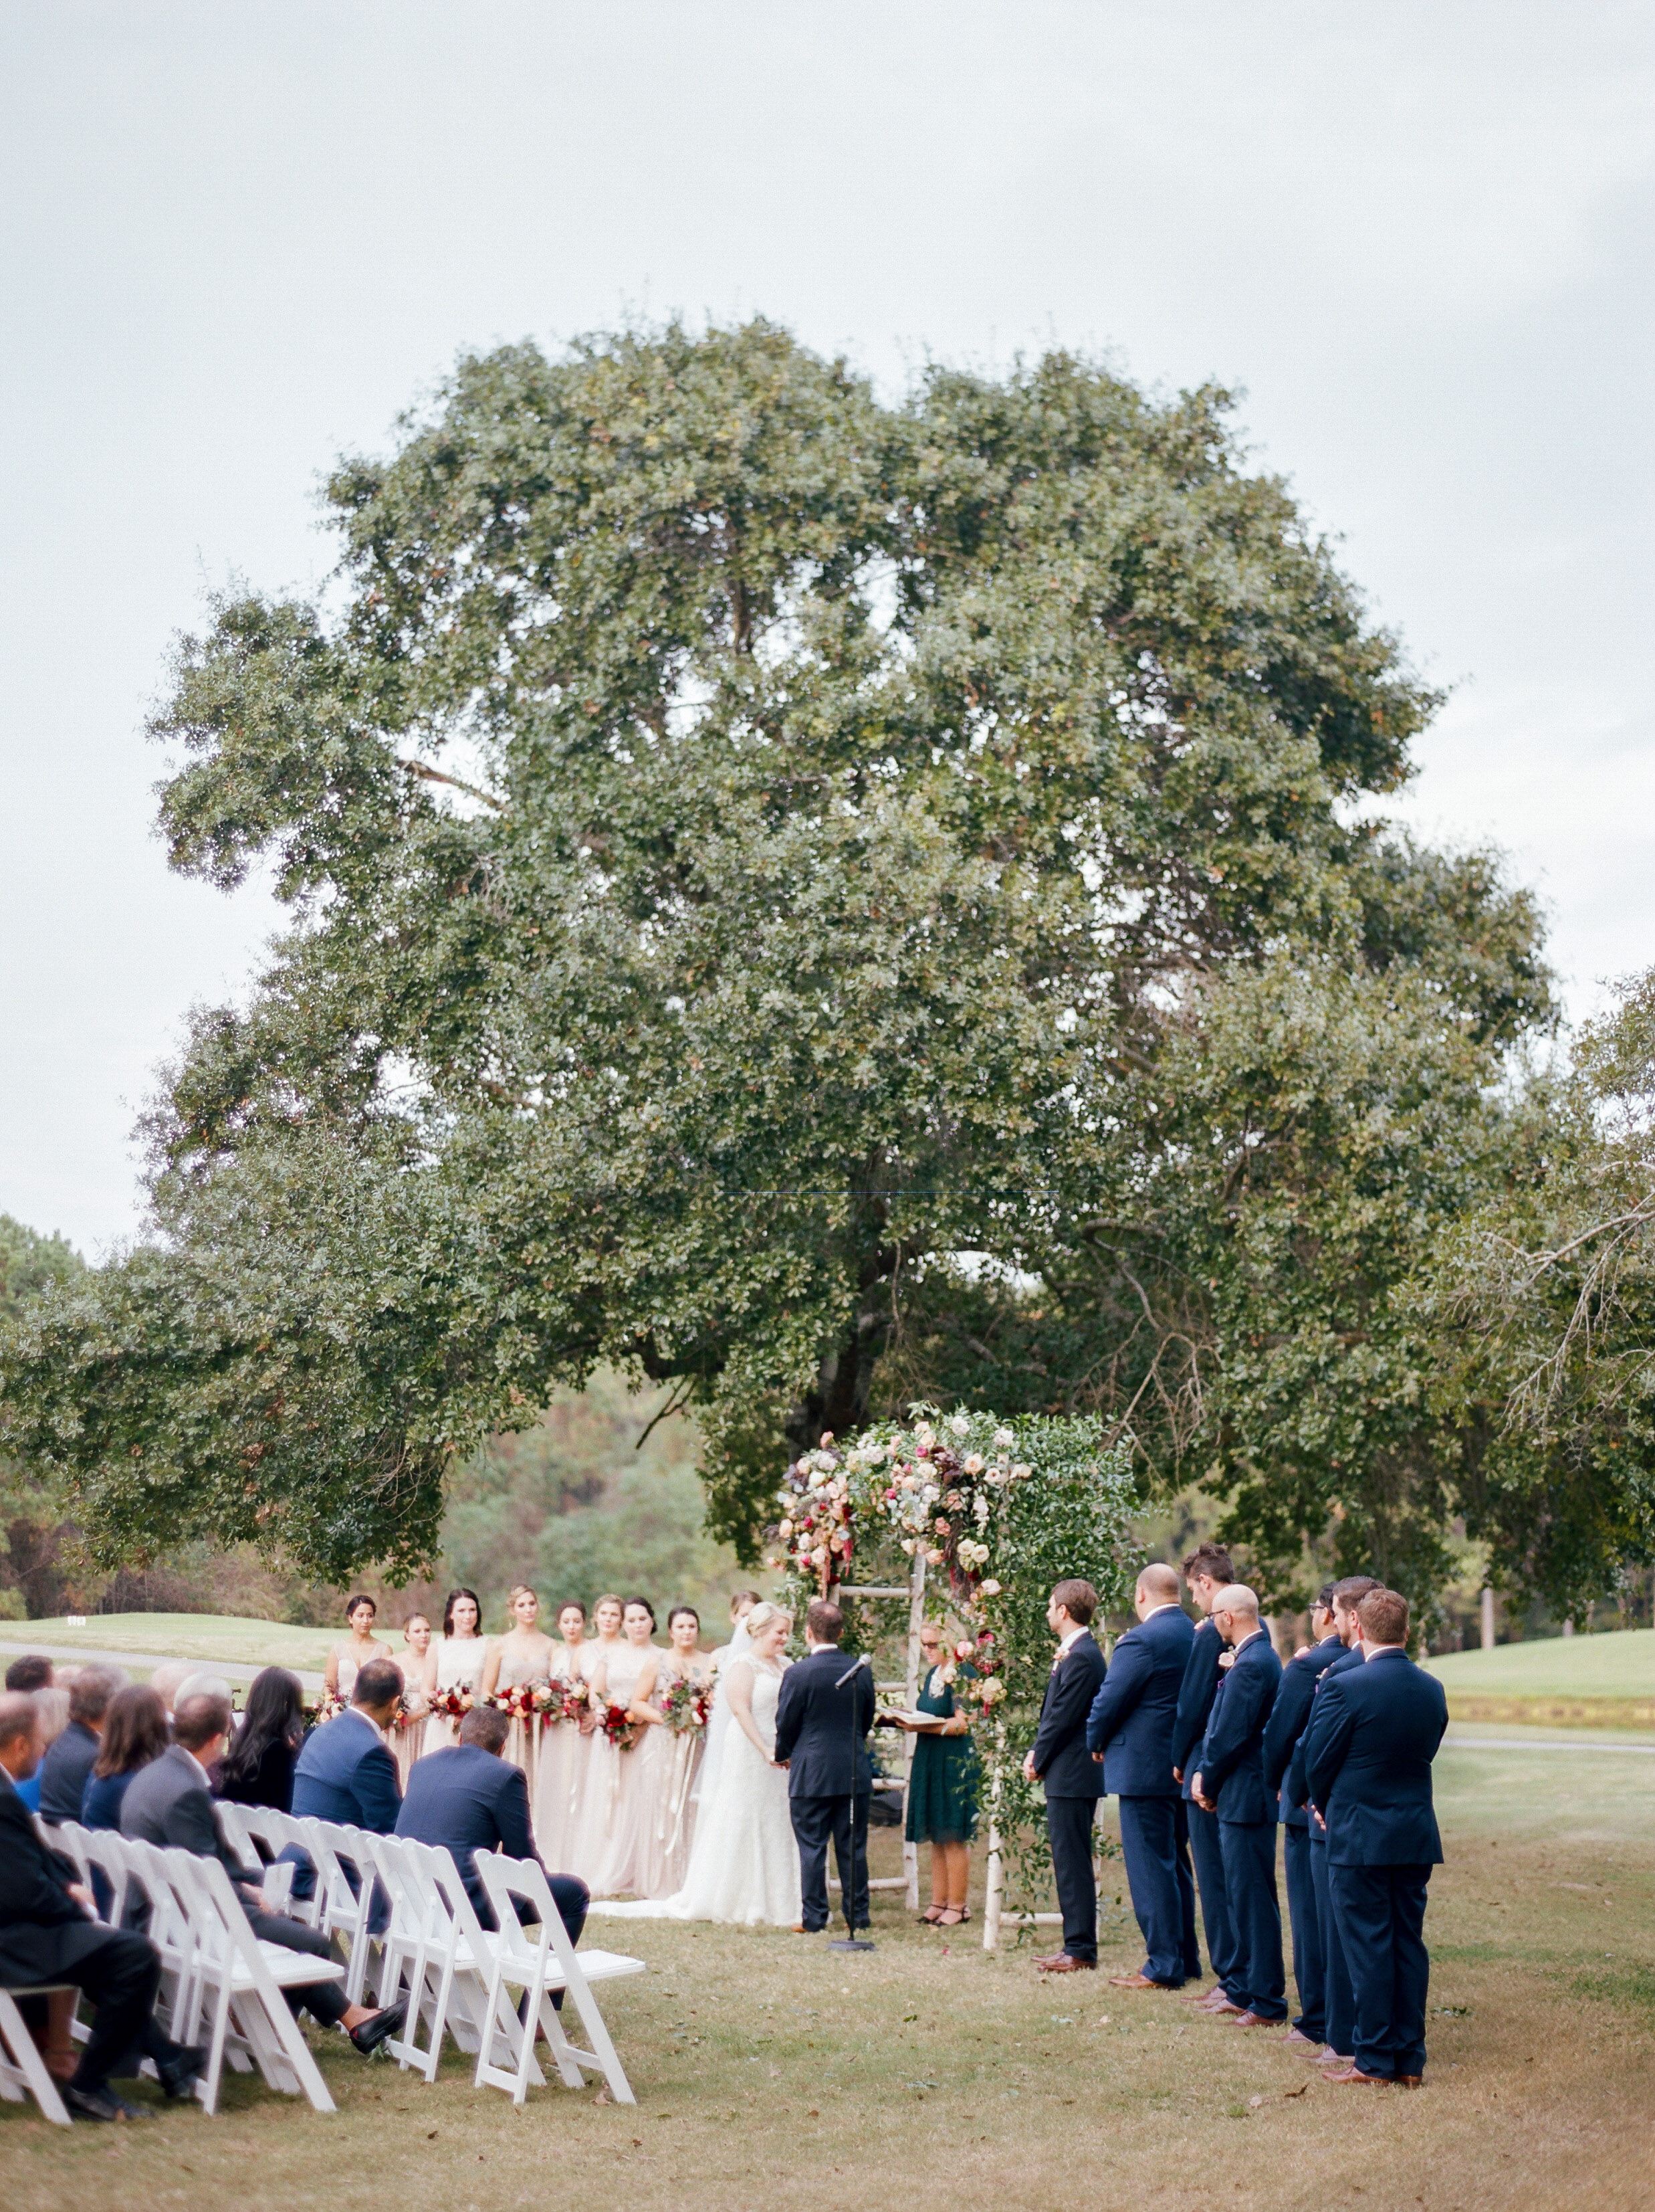 Houston-Wedding-Photographer-Fine-Art-Film-Destination-Style-Me-Pretty-Austin-Dallas-New-Orleans-Dana-Fernandez-Photography-The+Woodlands-Country-Club-18.jpg